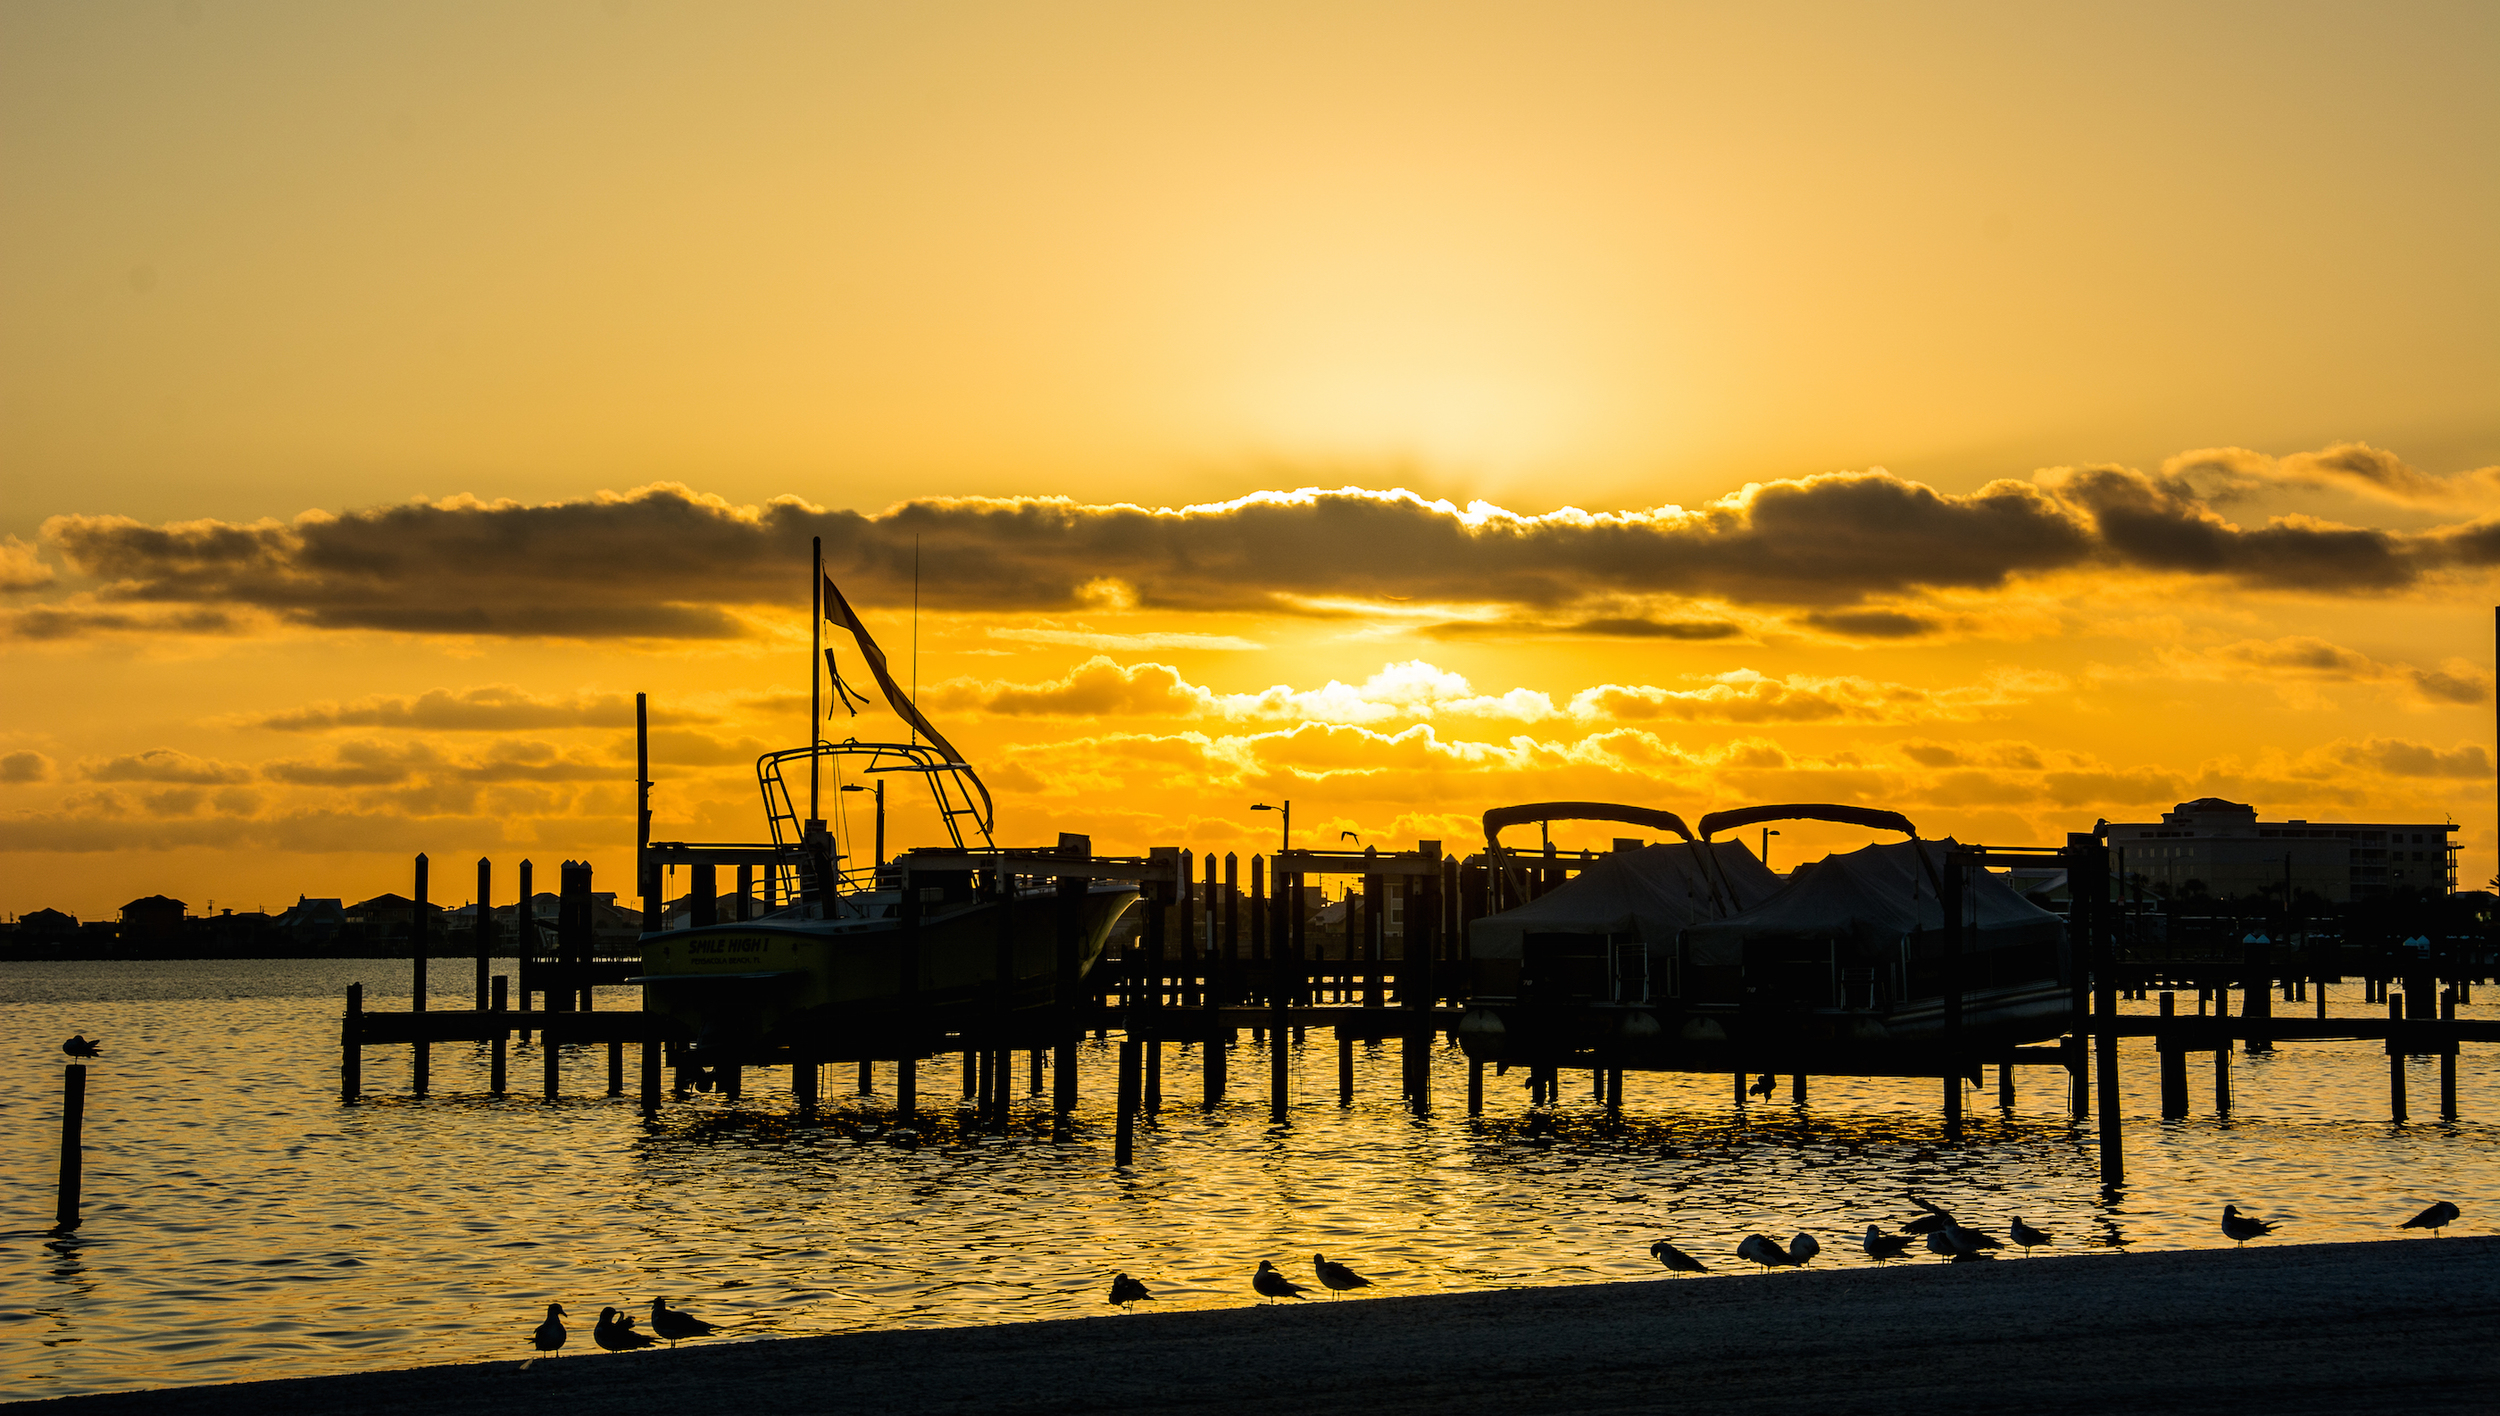 Golden Dock of the Bay - Leslie Brown